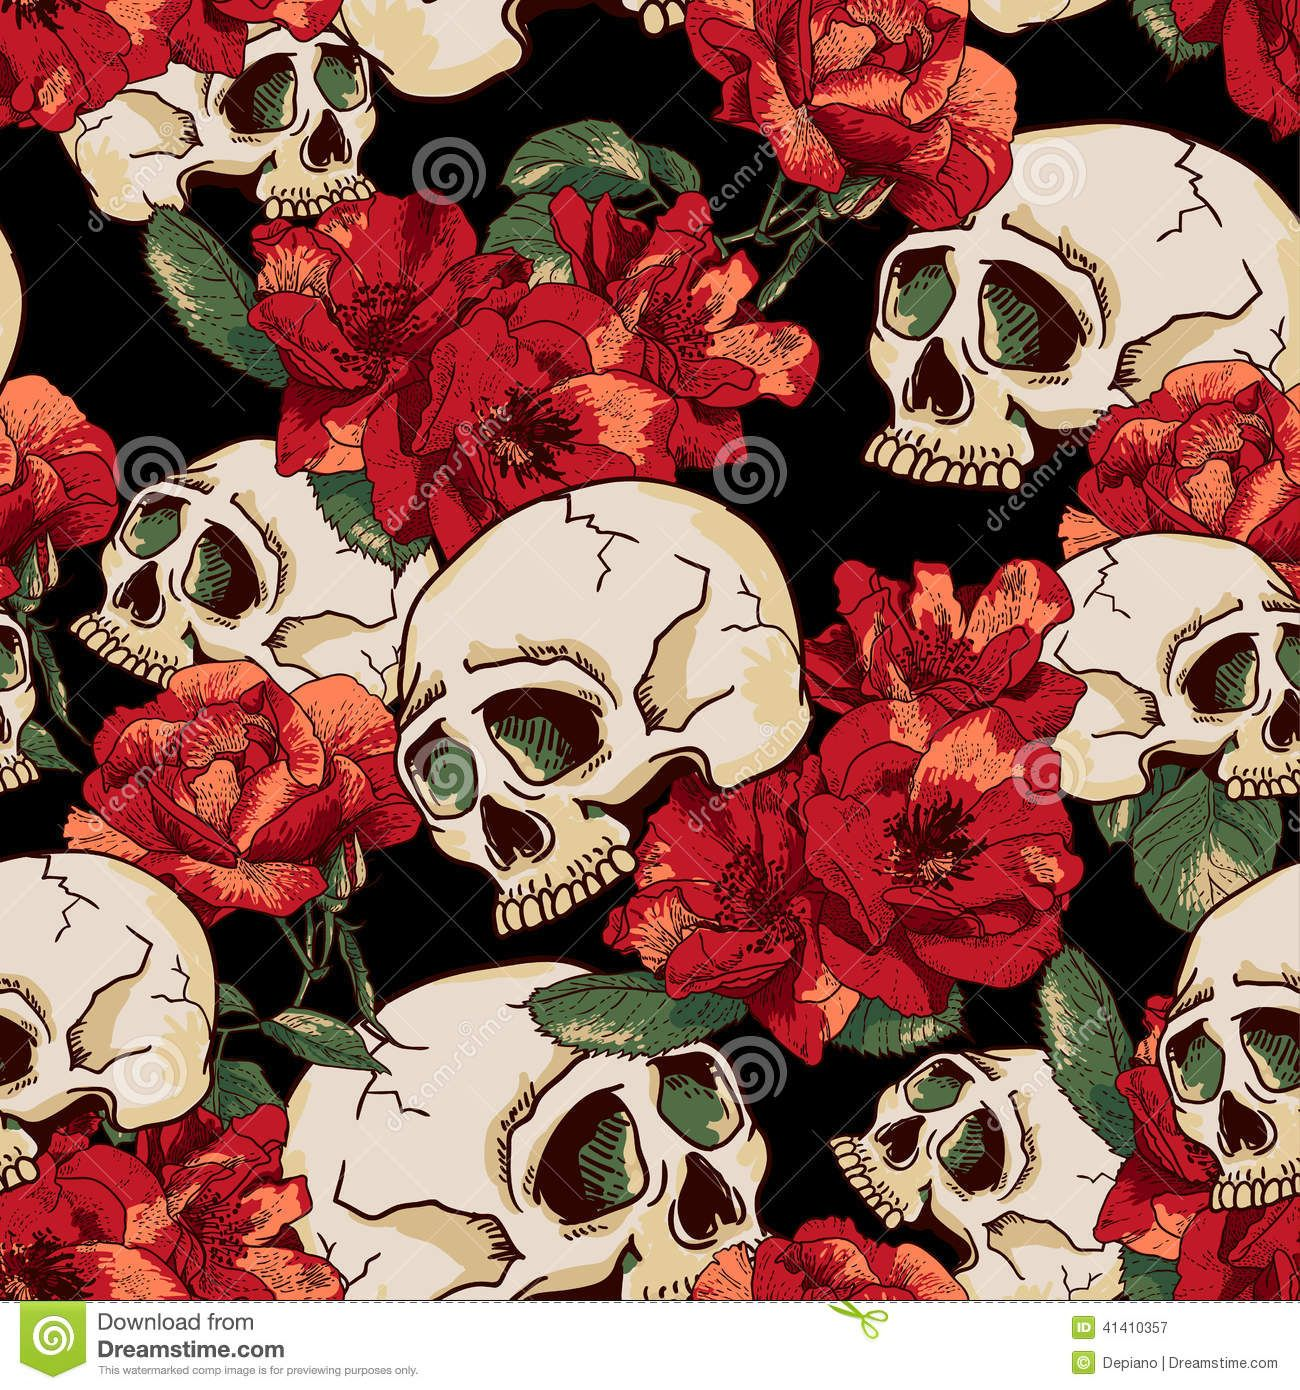 Download Wallpaper Home Screen Skull - 27cd63f35588895b0464f82cdb095386  Photograph_503235.jpg